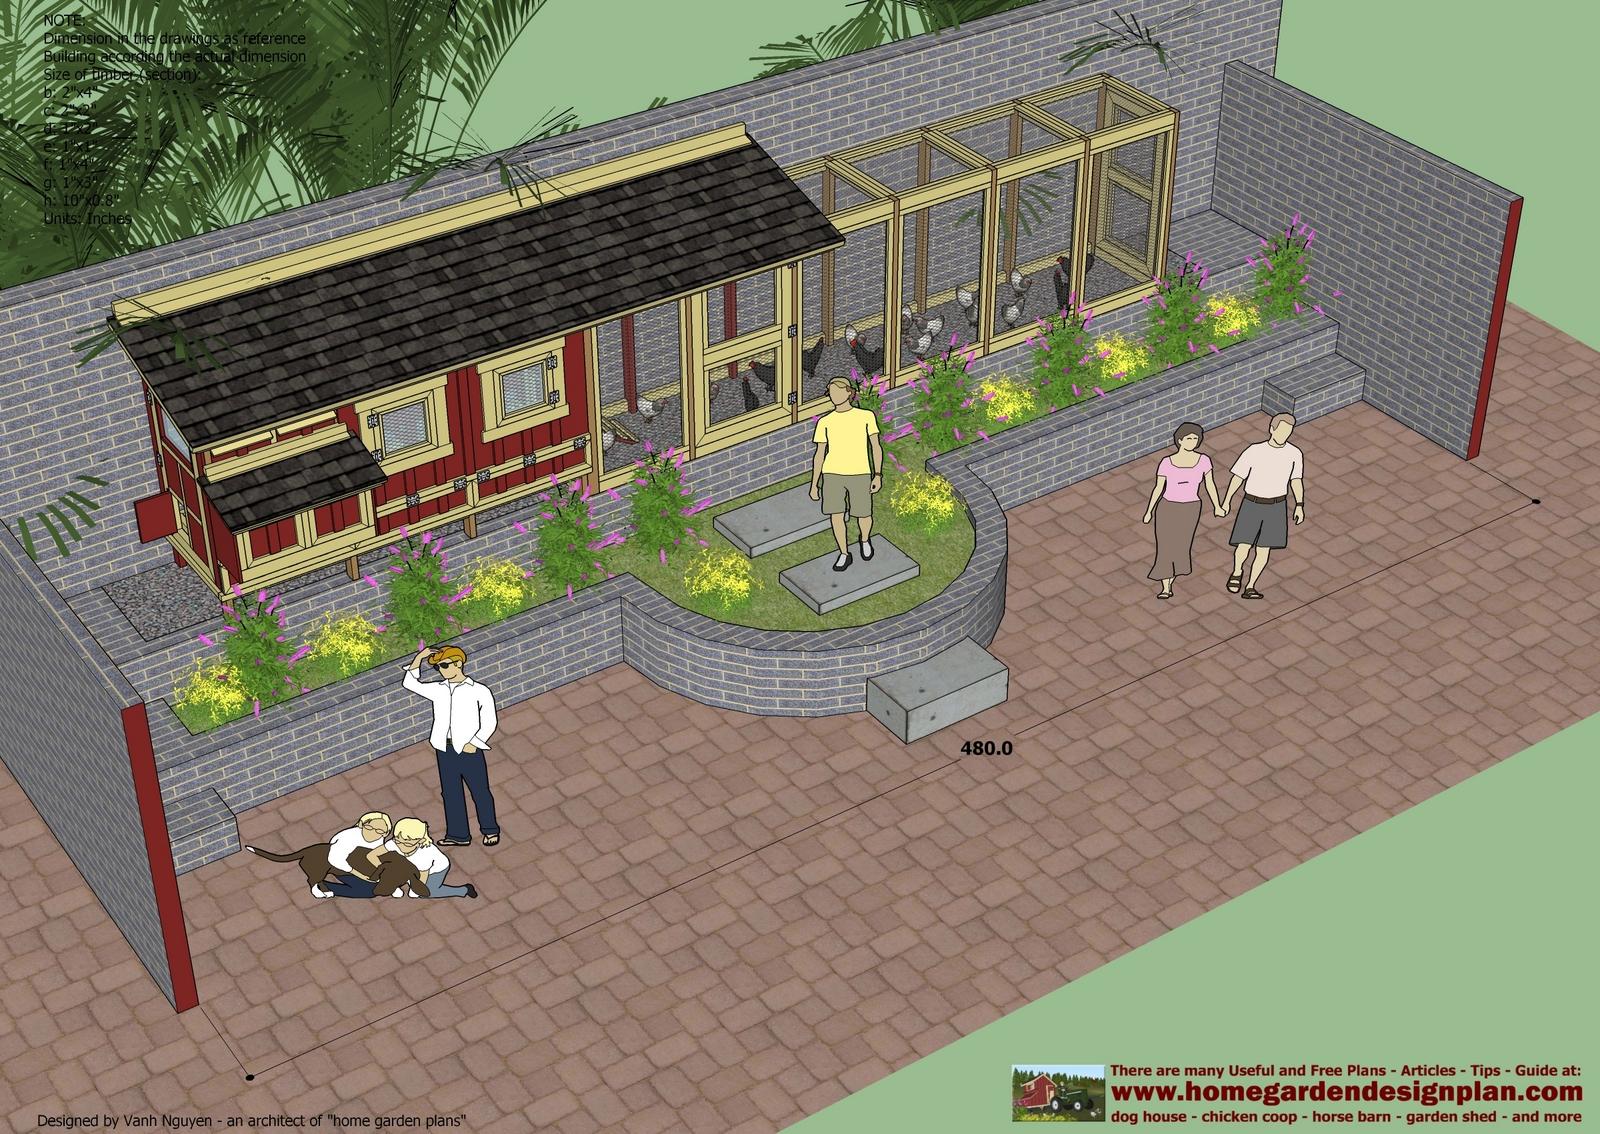 Home garden plans february 2013 for Home garden design pdf